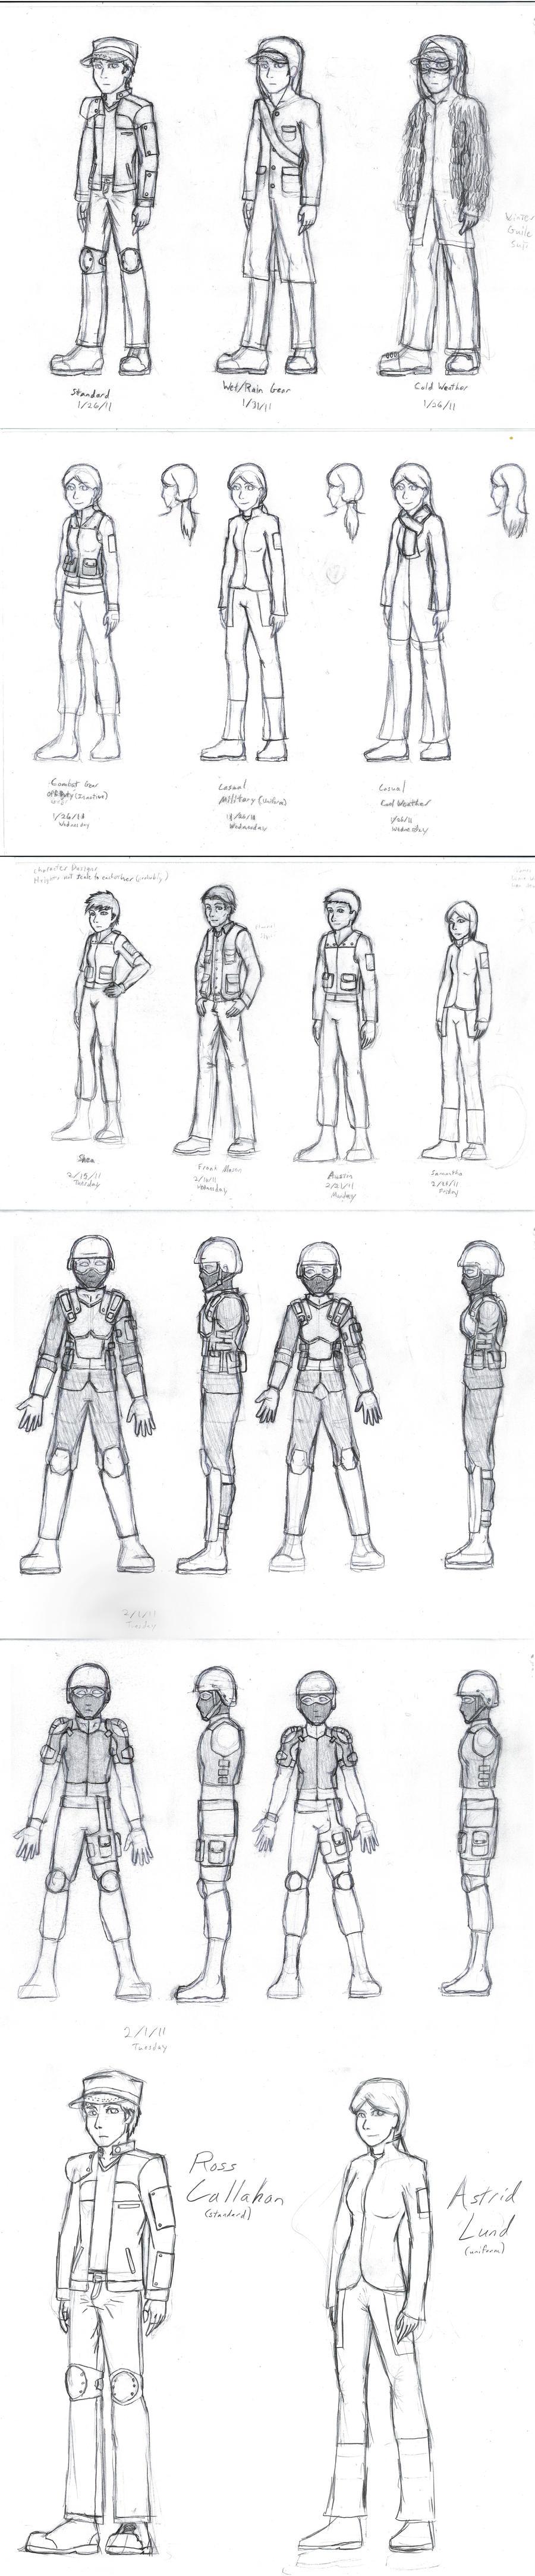 Ross Comic Sketches by Dancing-Sword